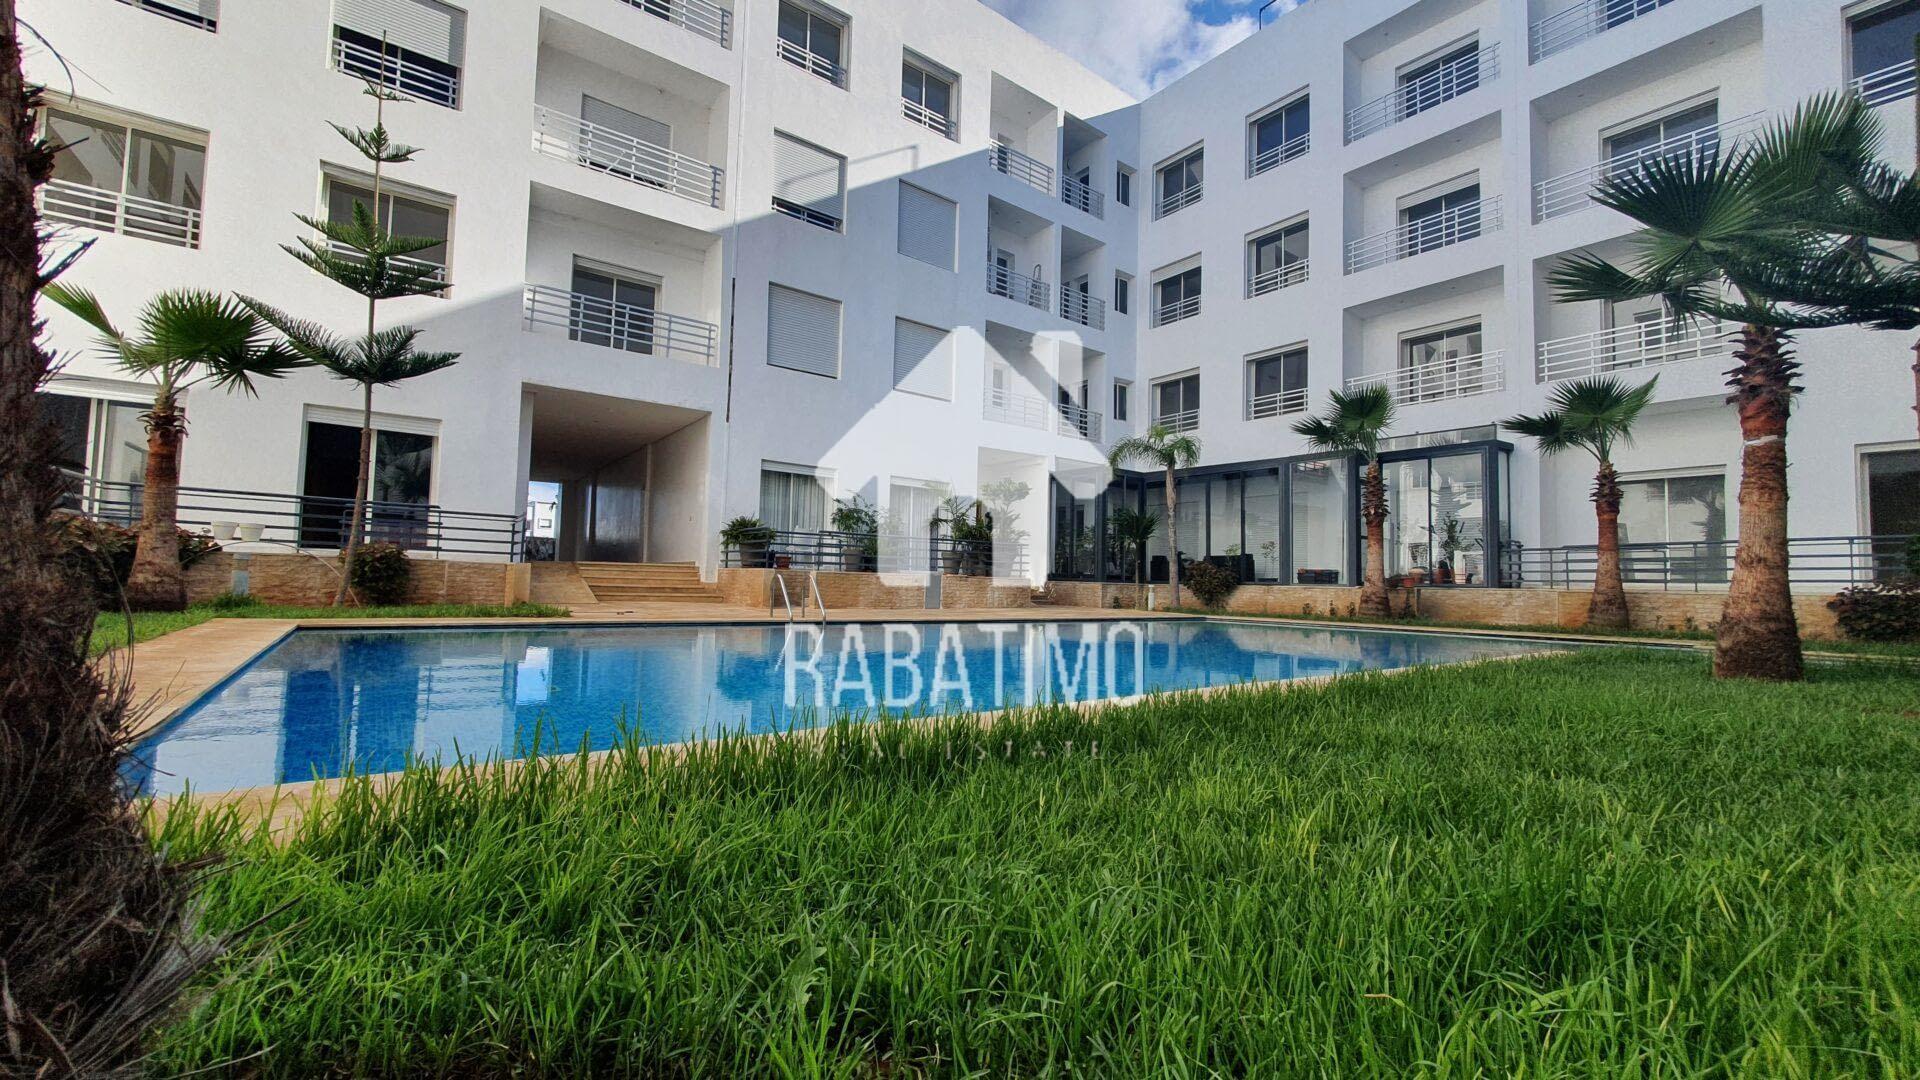 location appartement meublé Harhoura résidence piscine